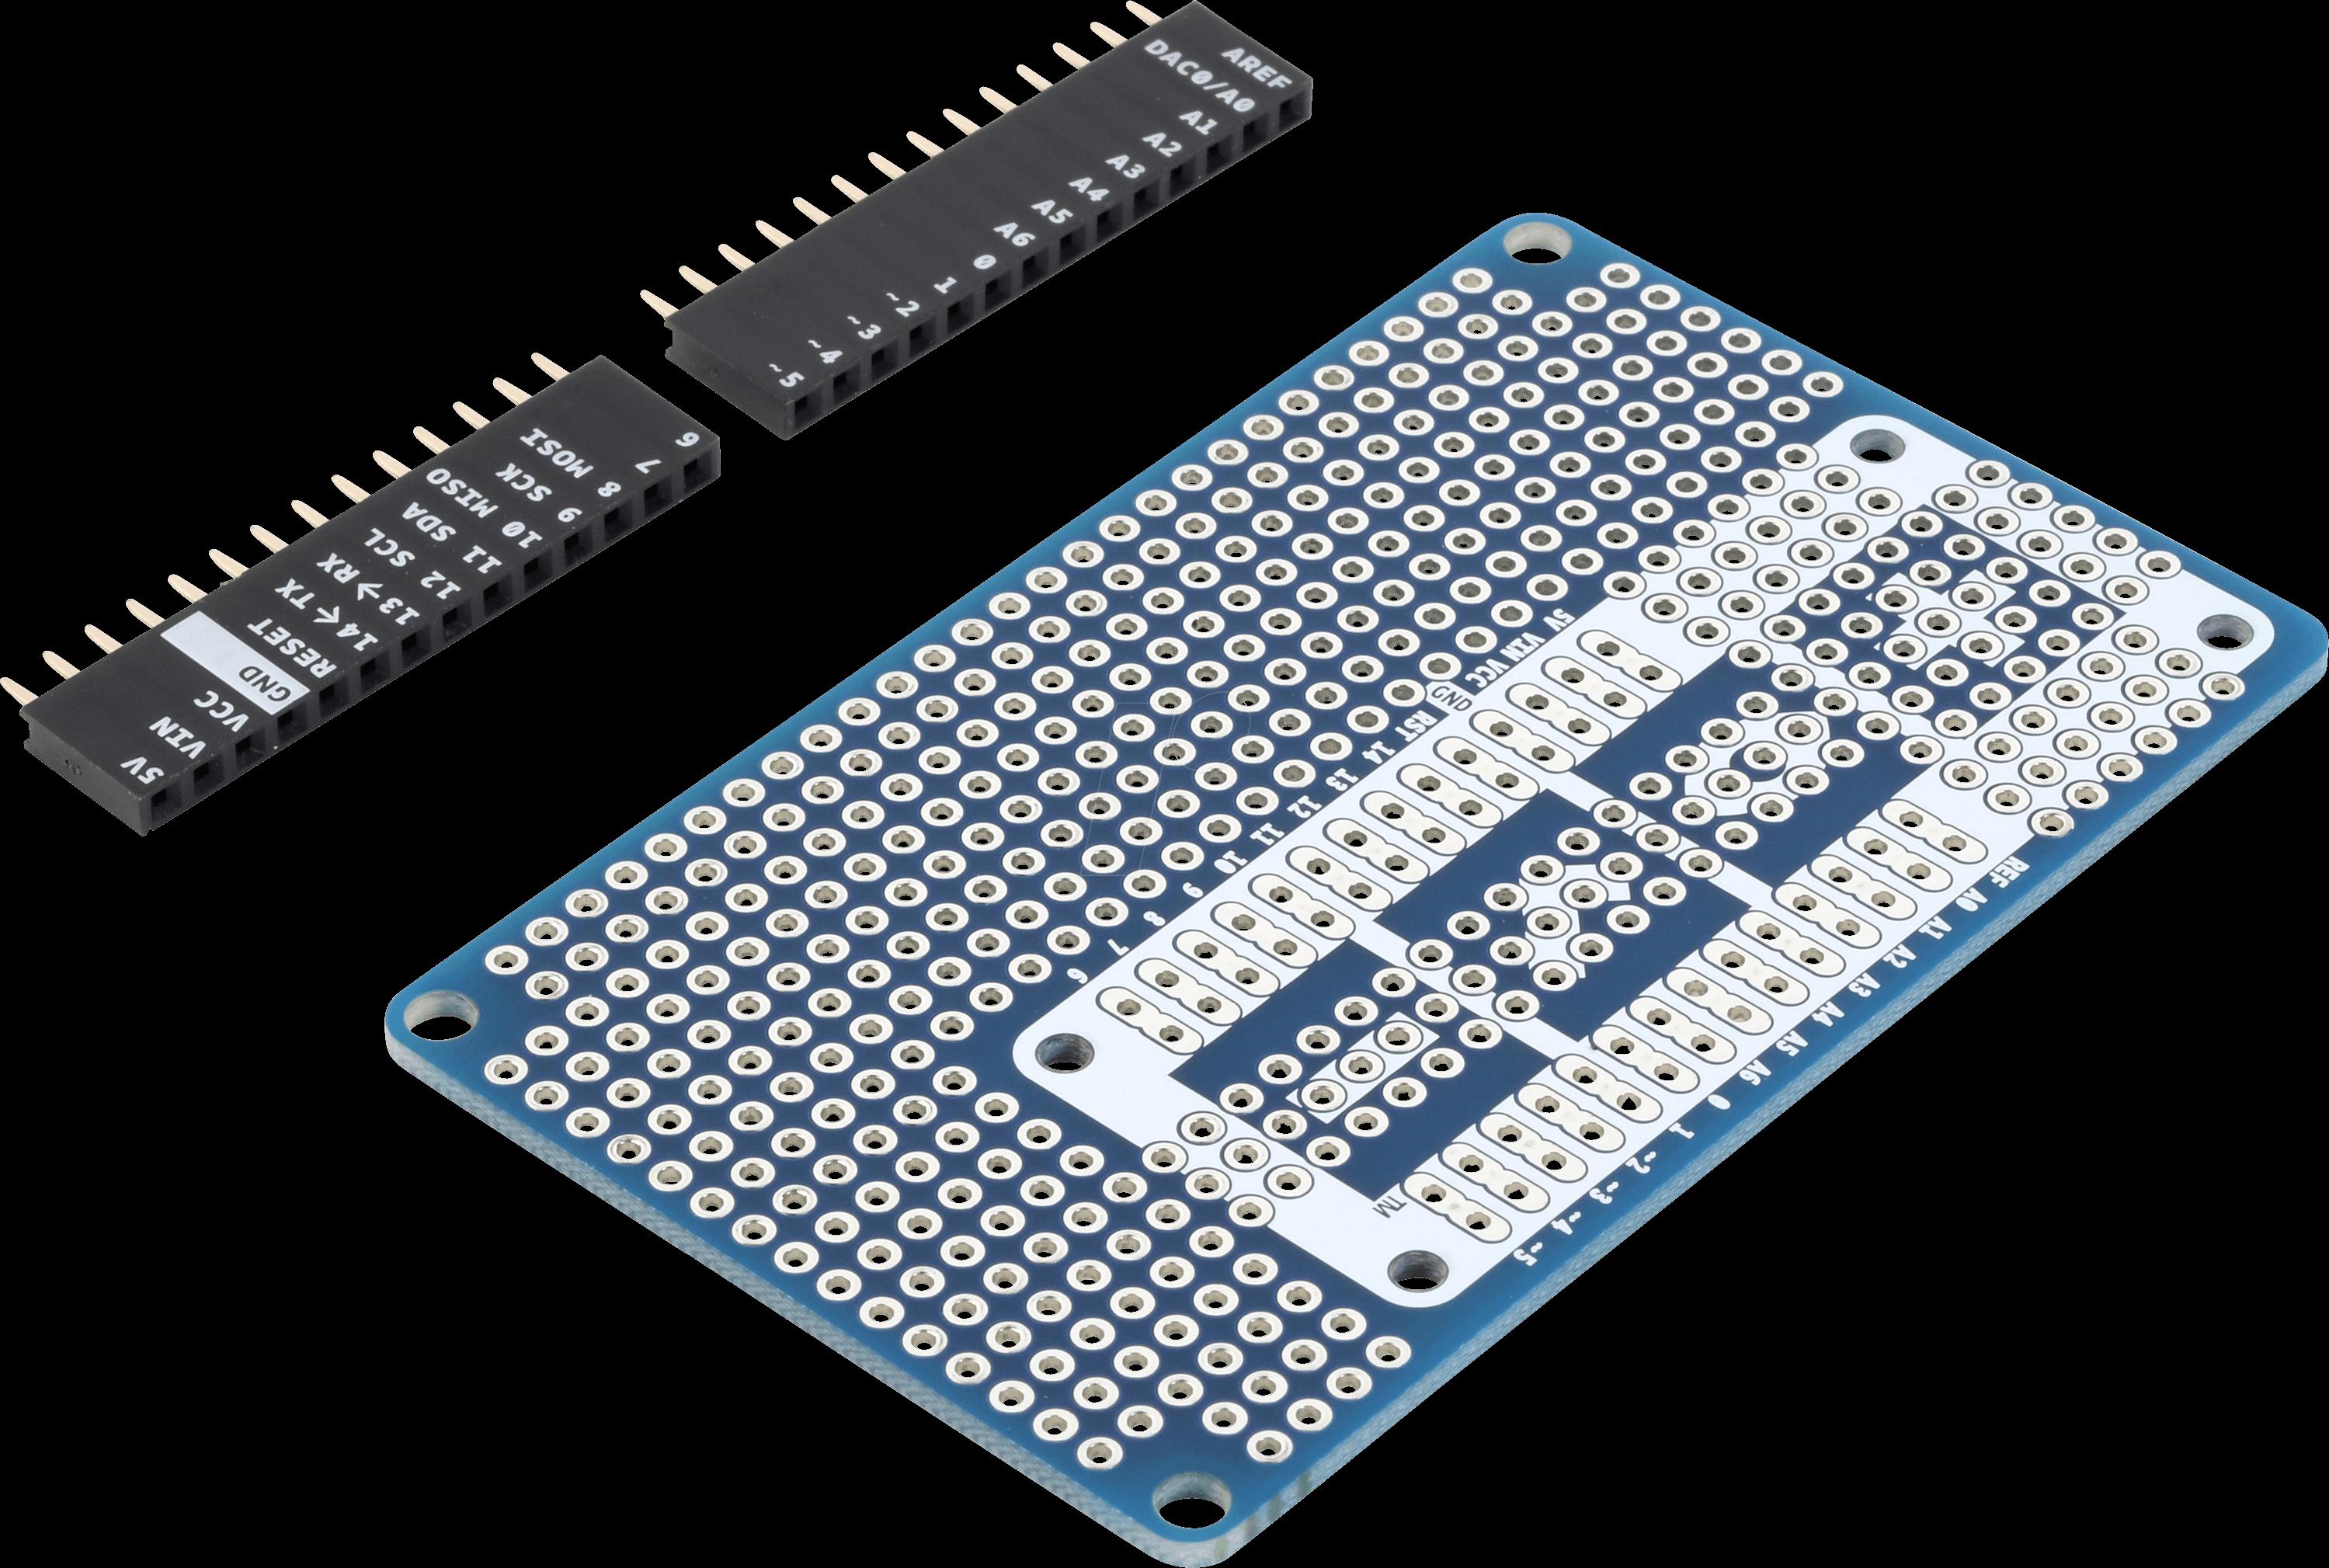 ARD SHD P MKR L - Arduino Shield - Proto Shield MKR Large